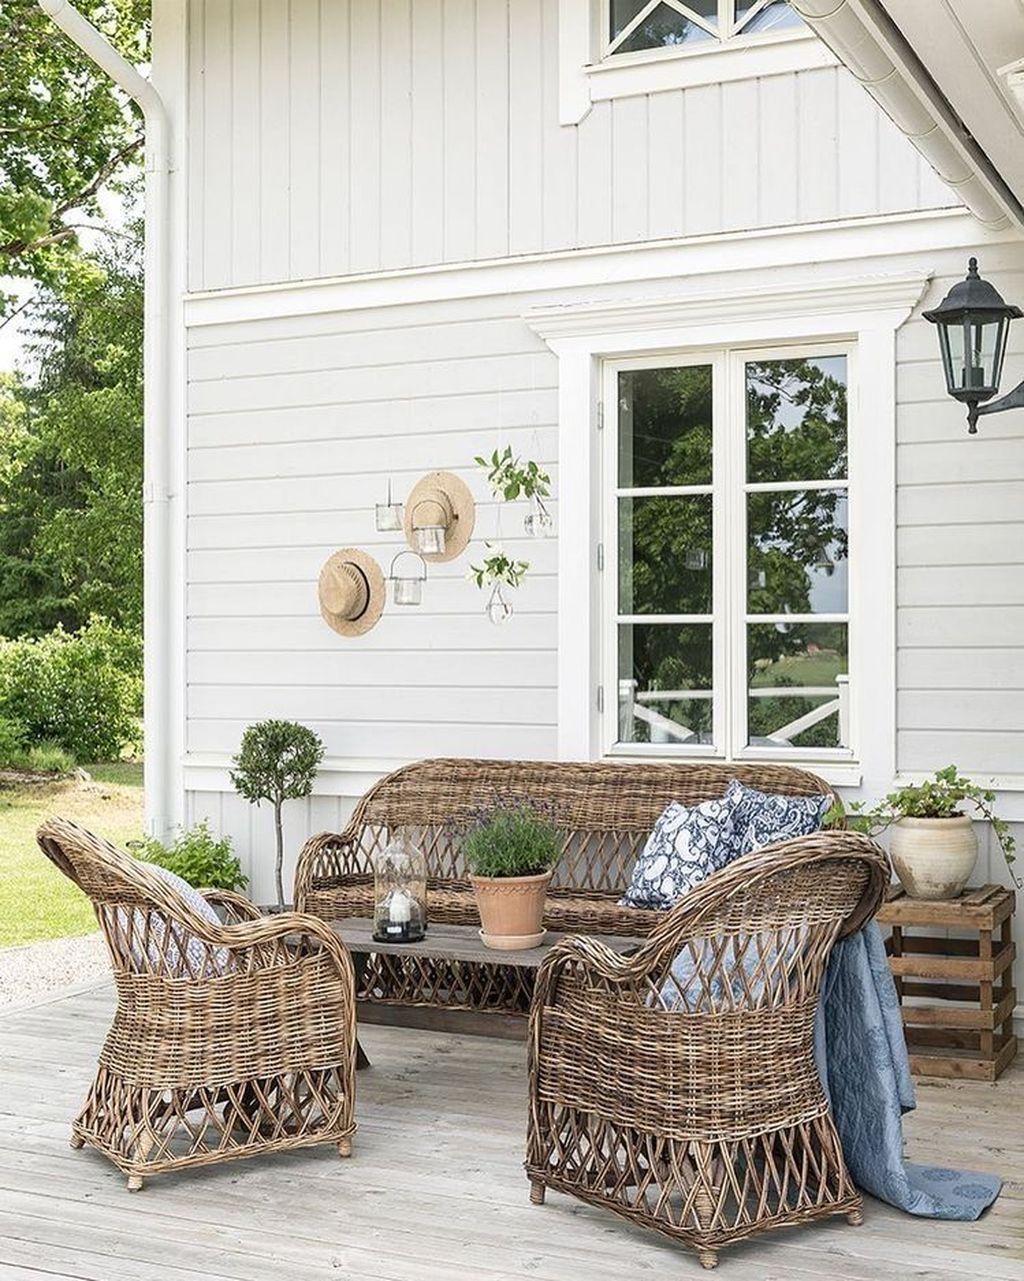 Stunning Summer House Colors Exterior Ideas 23